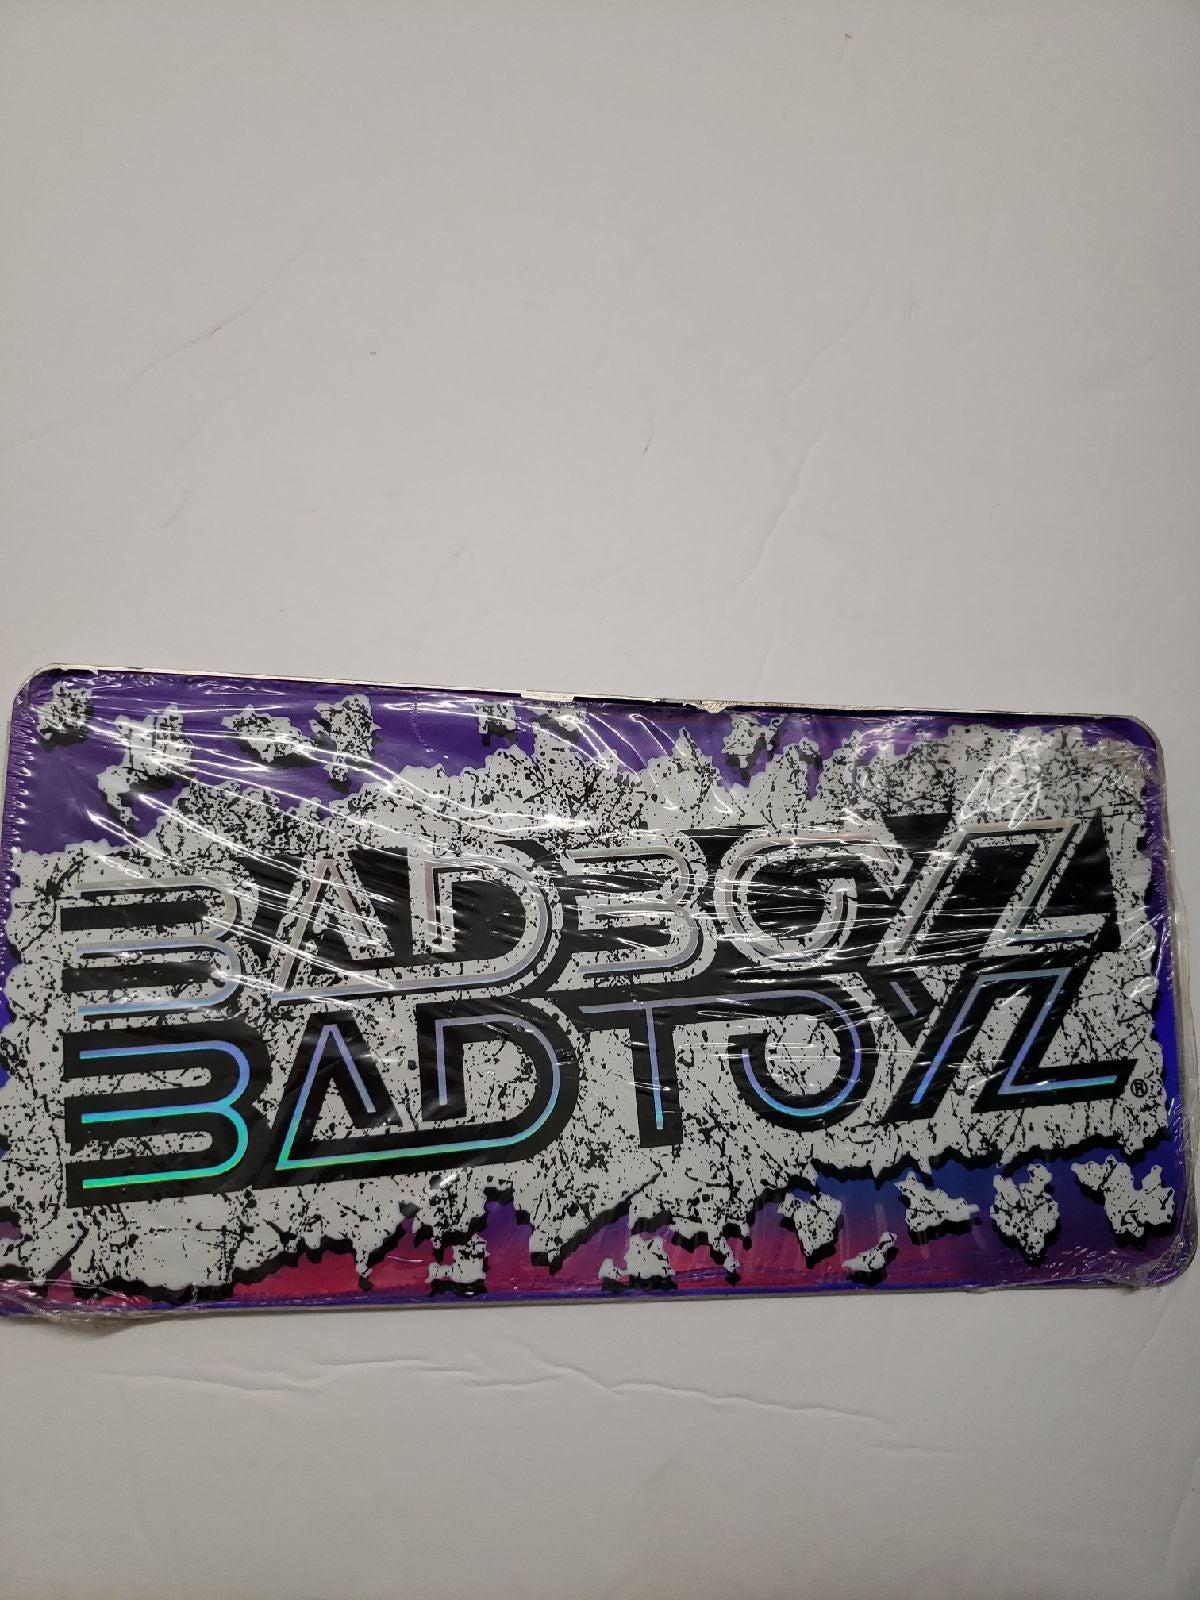 Badboyz badtoyz purple license plate new